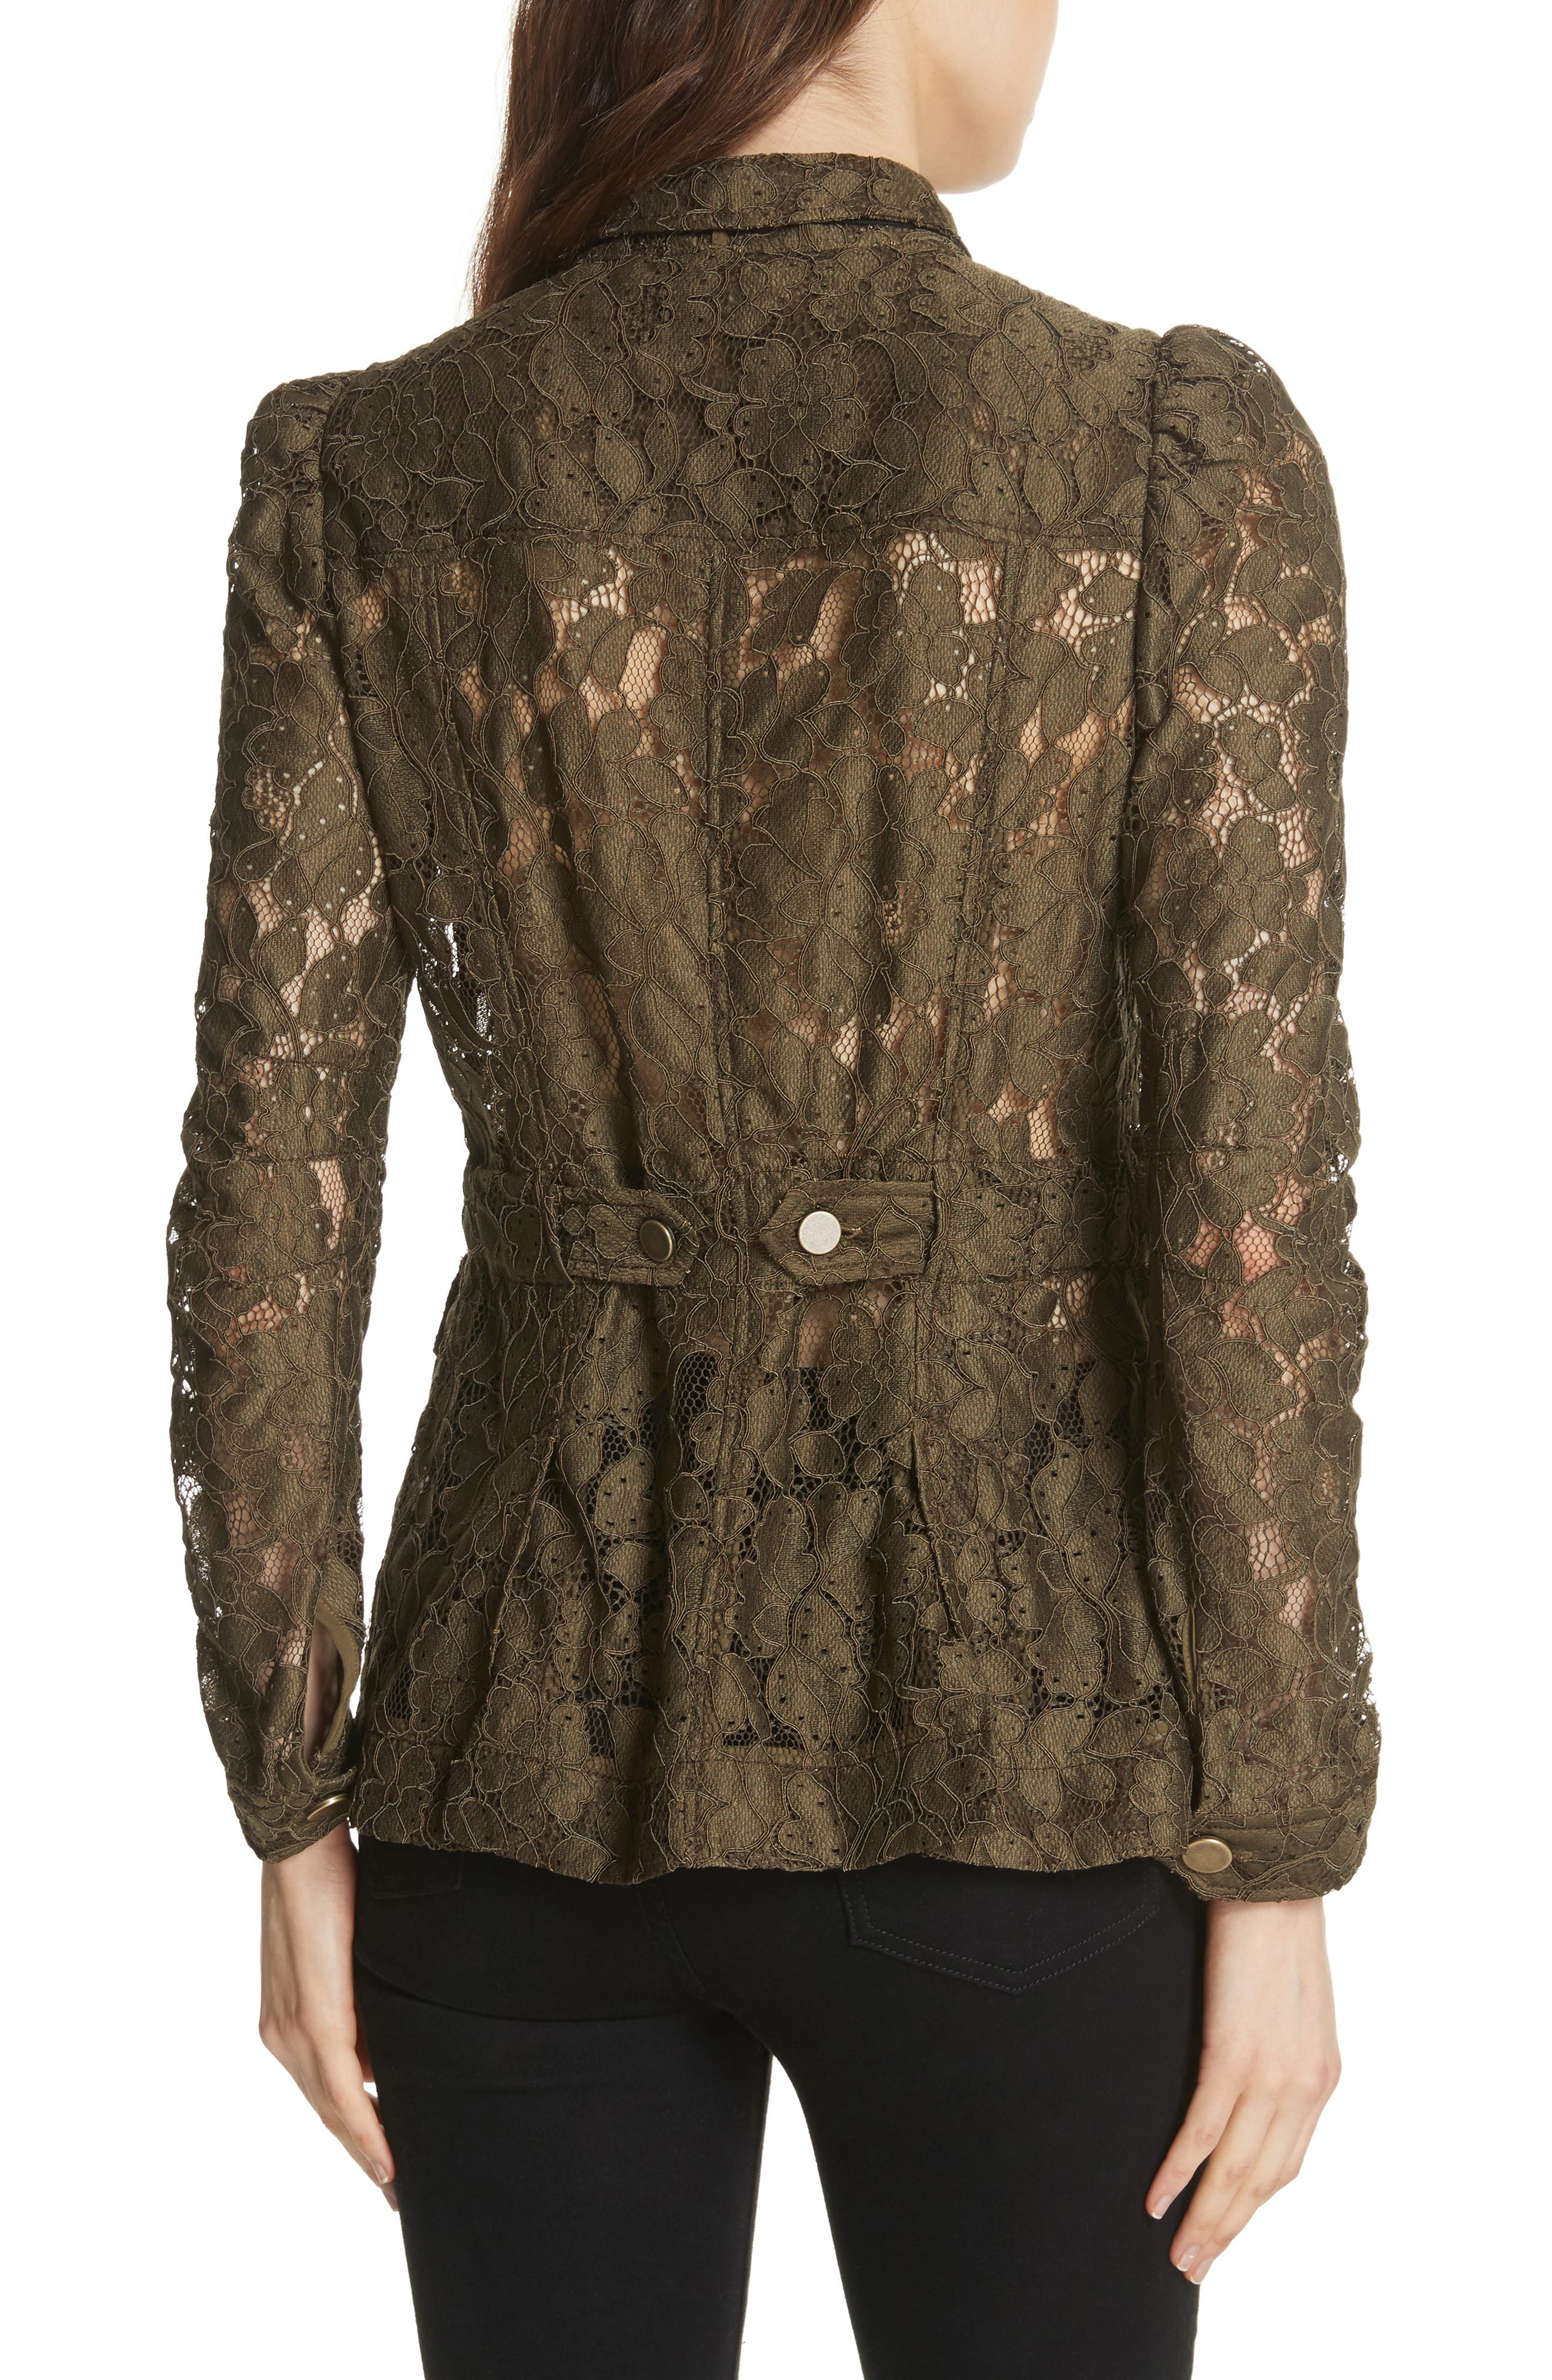 Daniela Tie Neck Lace Army Jacket,                             Alternate thumbnail 2, color,                             310